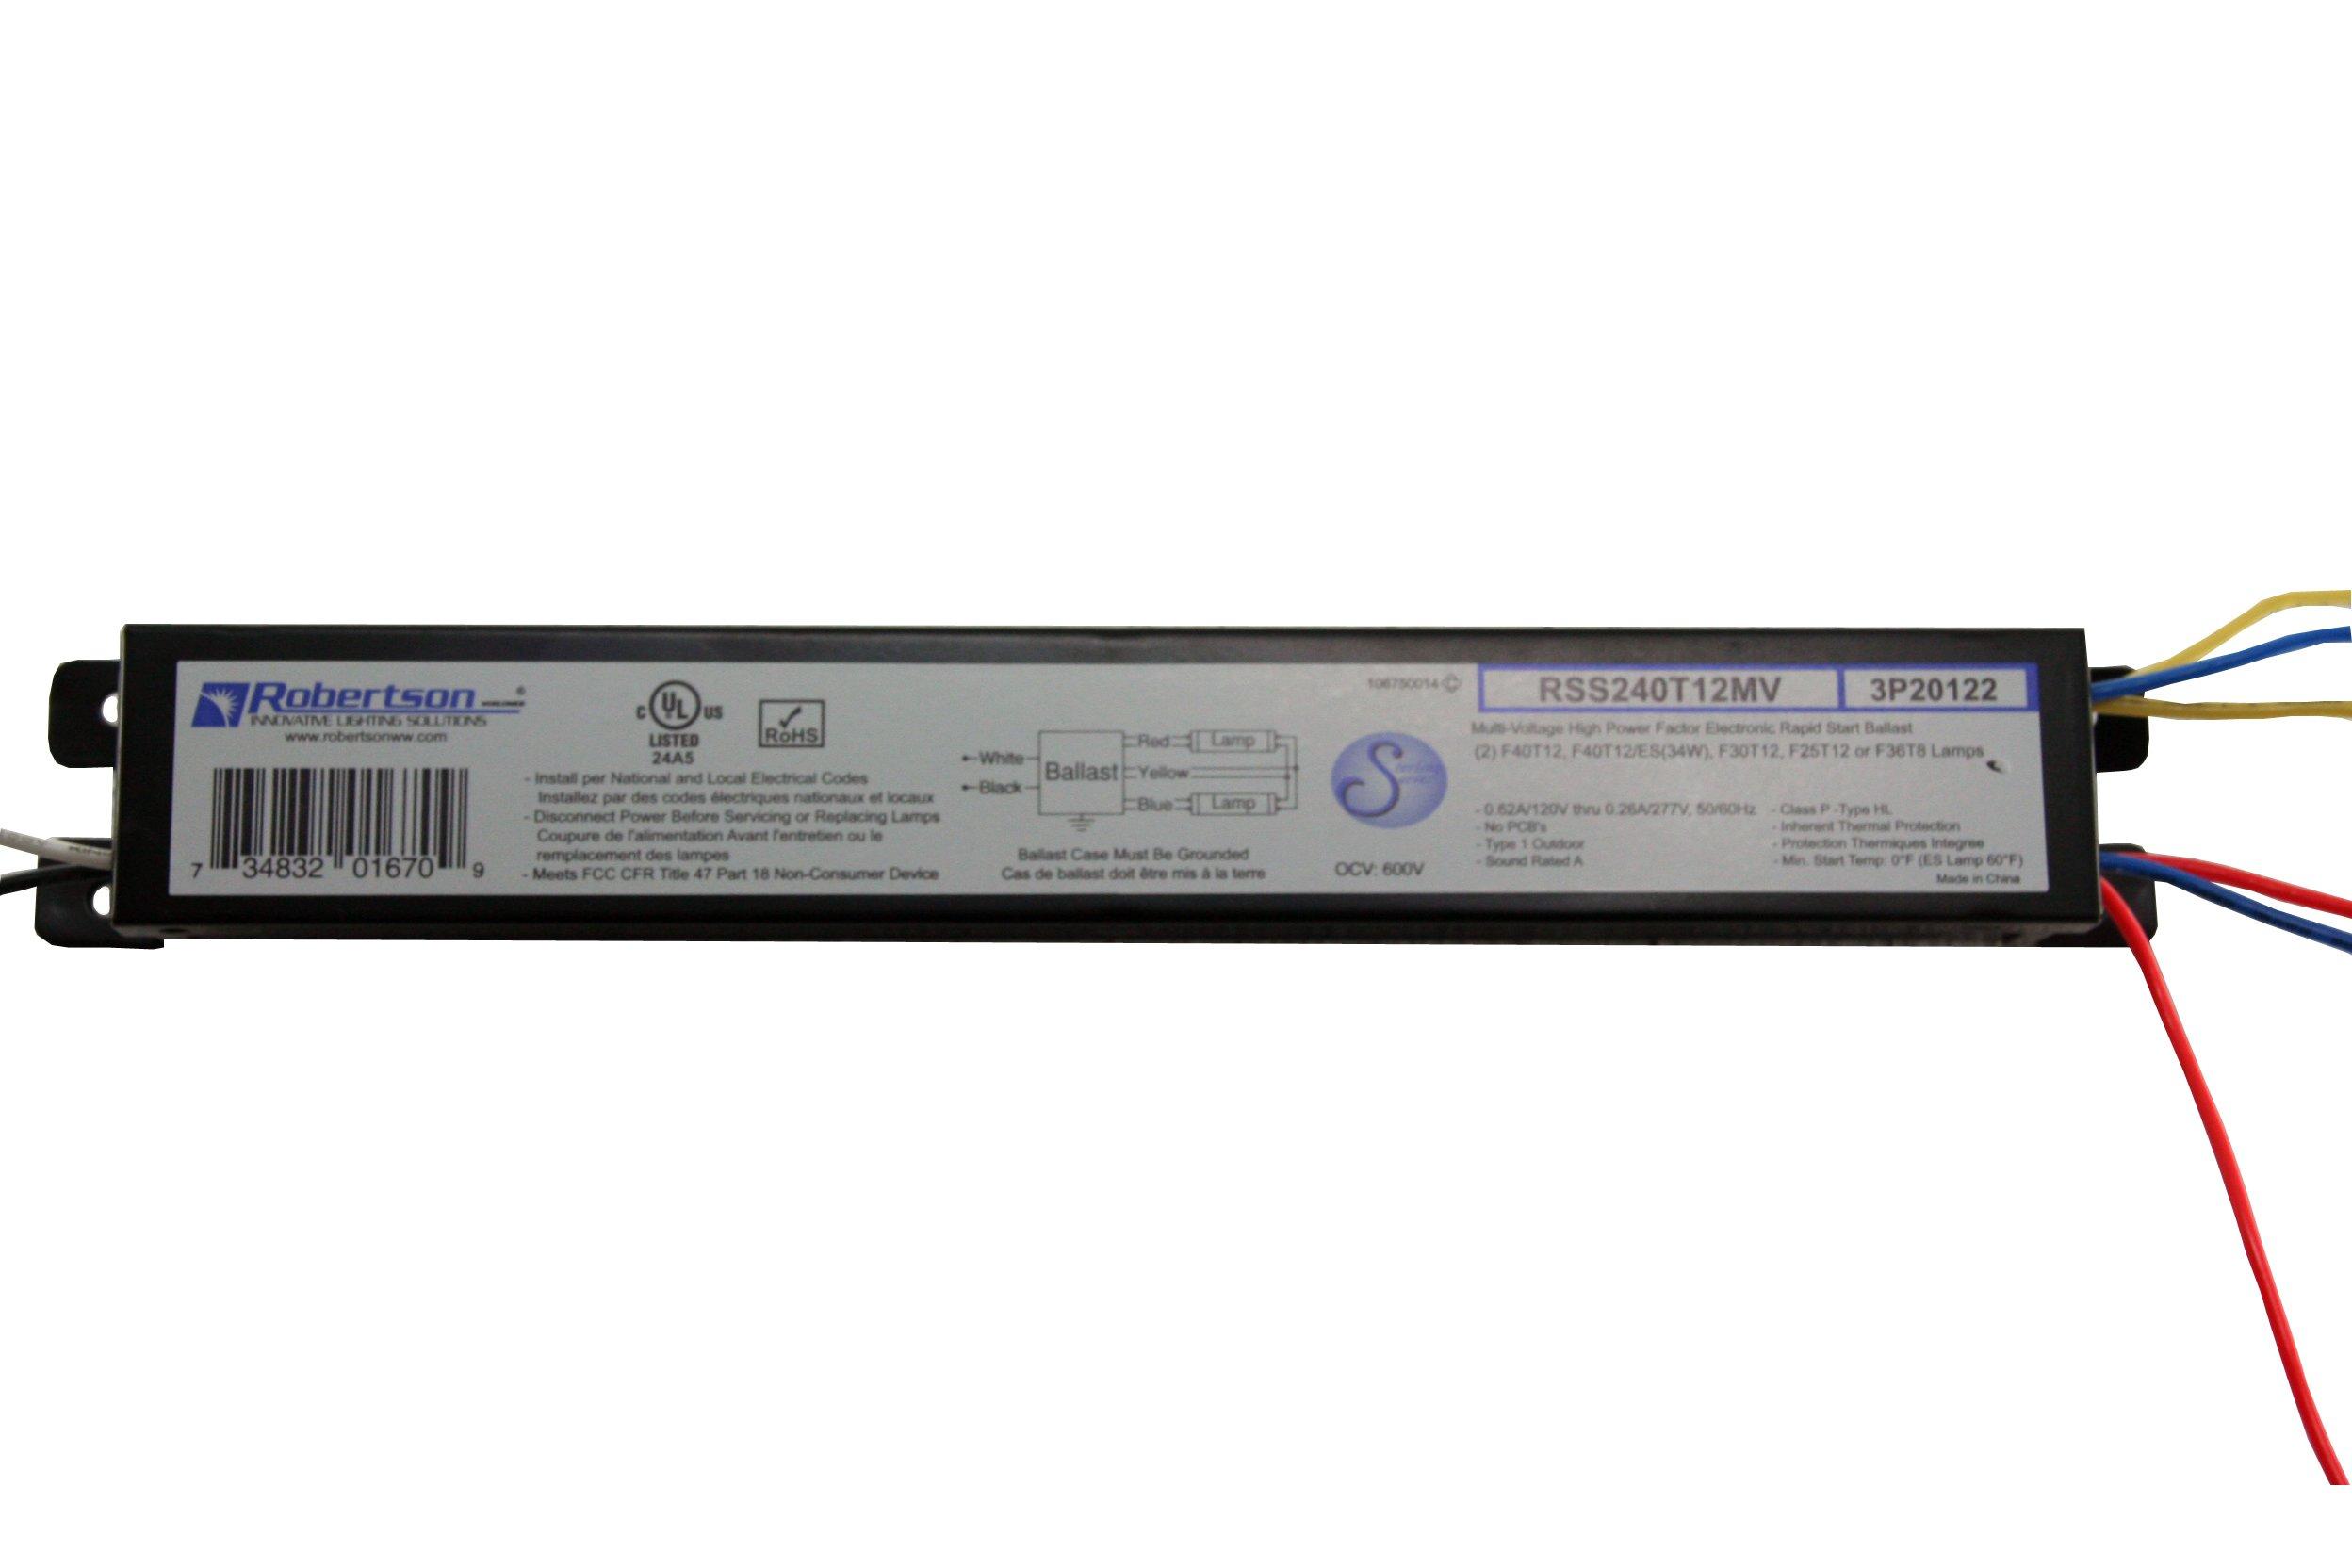 ROBERTSON 3P20122 RSS240T12MV /A Fluorescent eBallast for 2 F40T12 Linear Lamp, Rapid Start, 120-277Vac, 50-60Hz, Normal Ballast Factor, HPF (Successor to ROBERTSON 000791 RSS240T12MVIP)